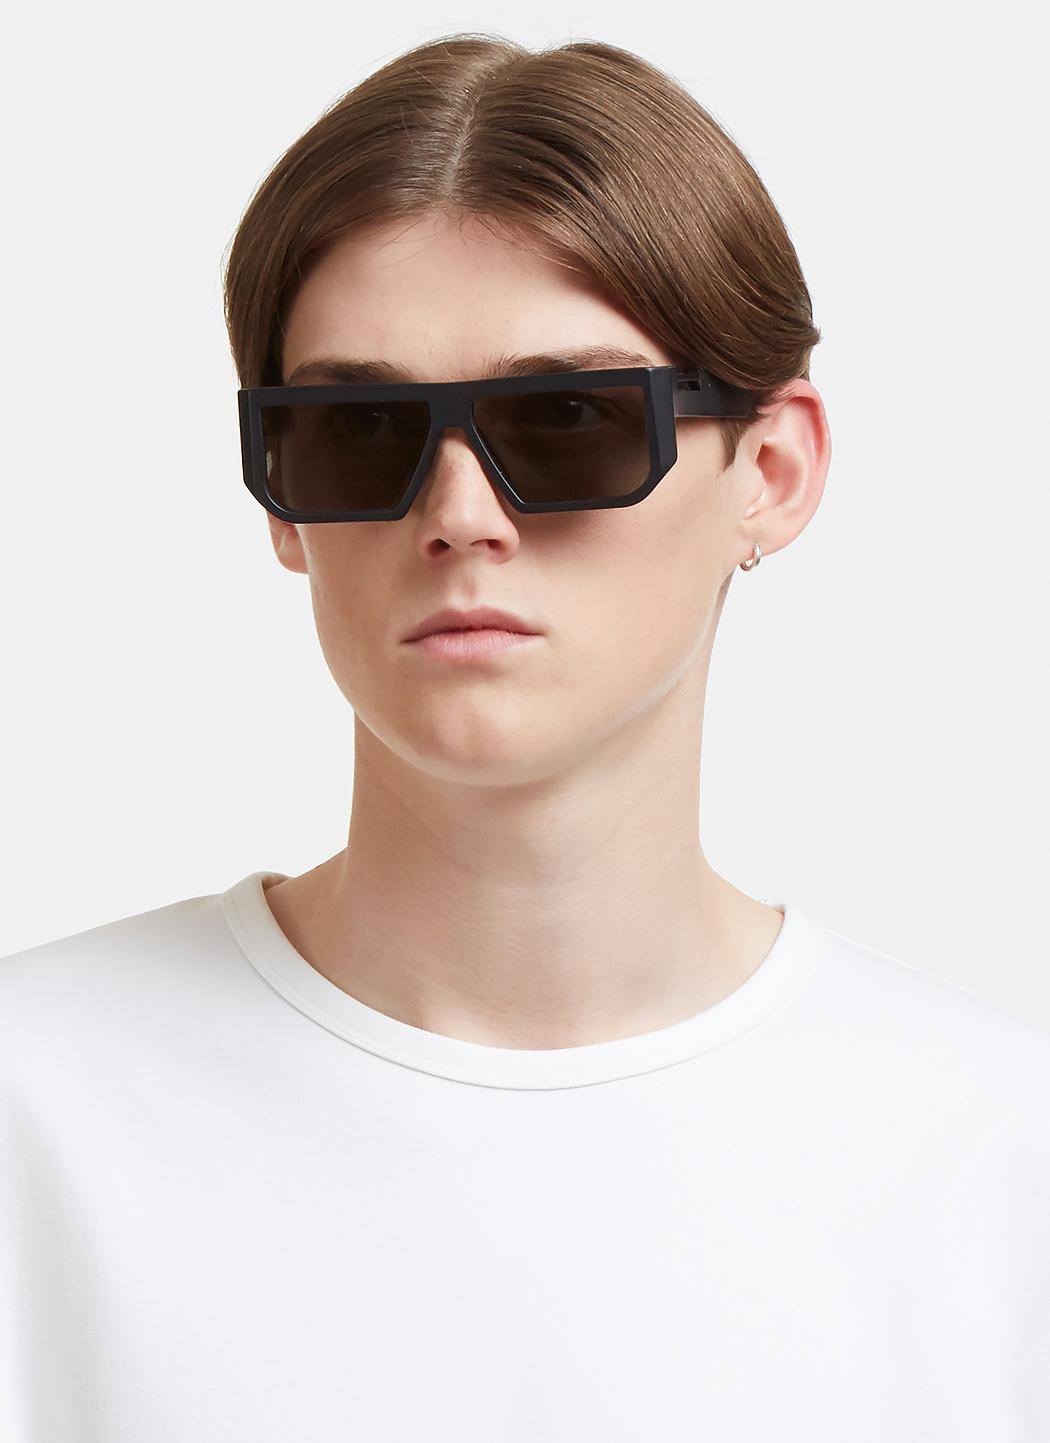 VAVA Rad Hourani Sunglasses In Black for Men